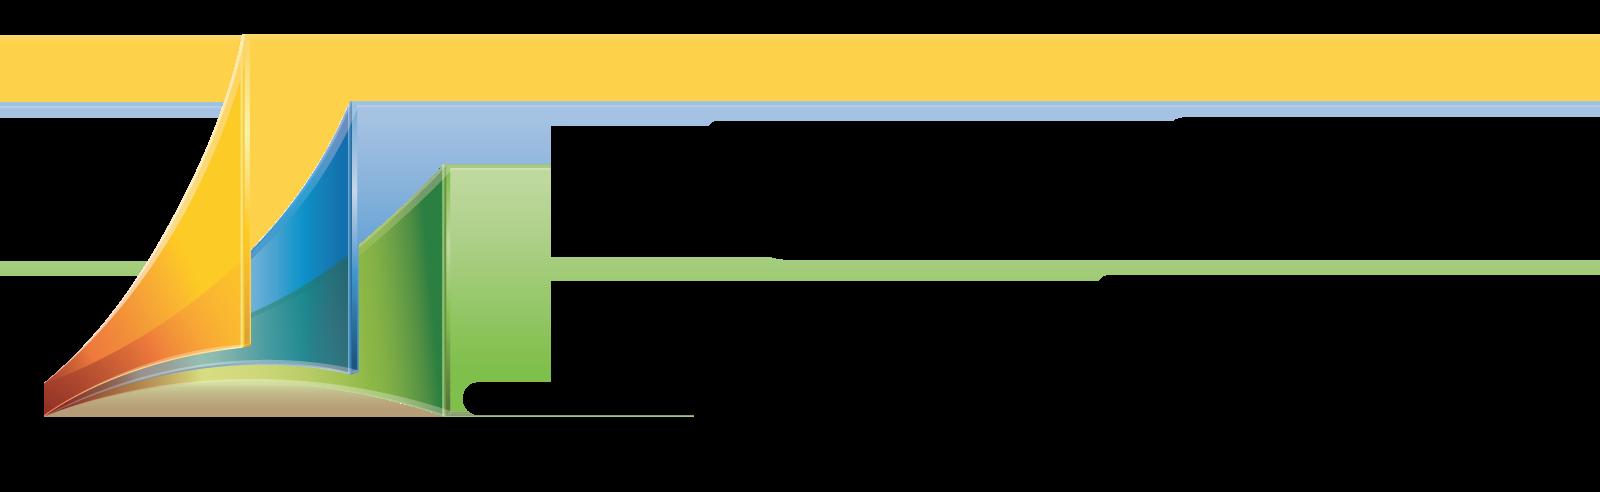 Dynamics-crm-logo